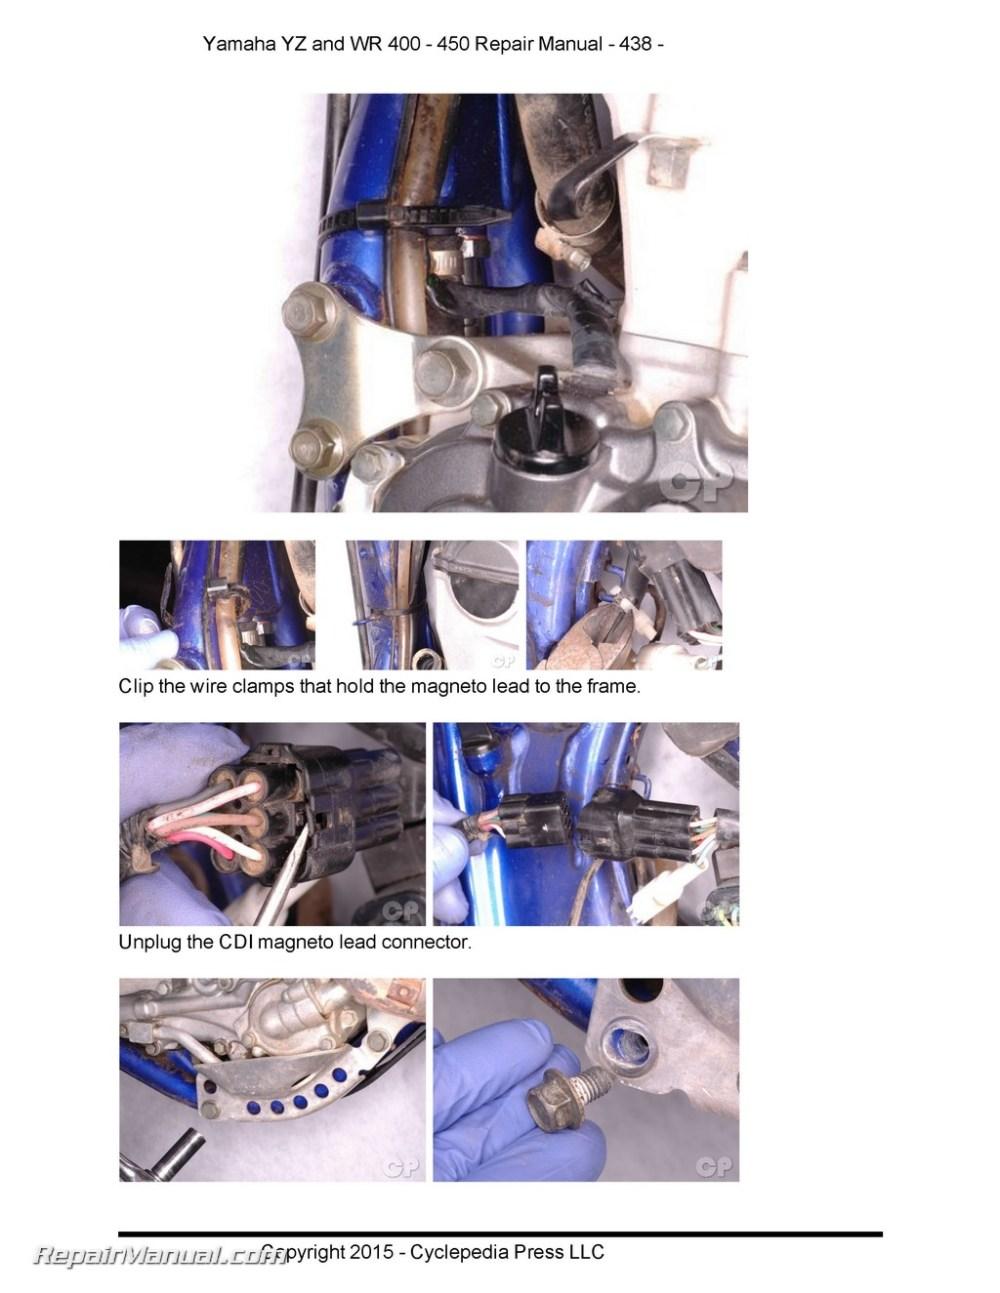 medium resolution of  array yamaha yz wr 400 426 450f cyclepedia printed motorcycle service manual rh repairmanual